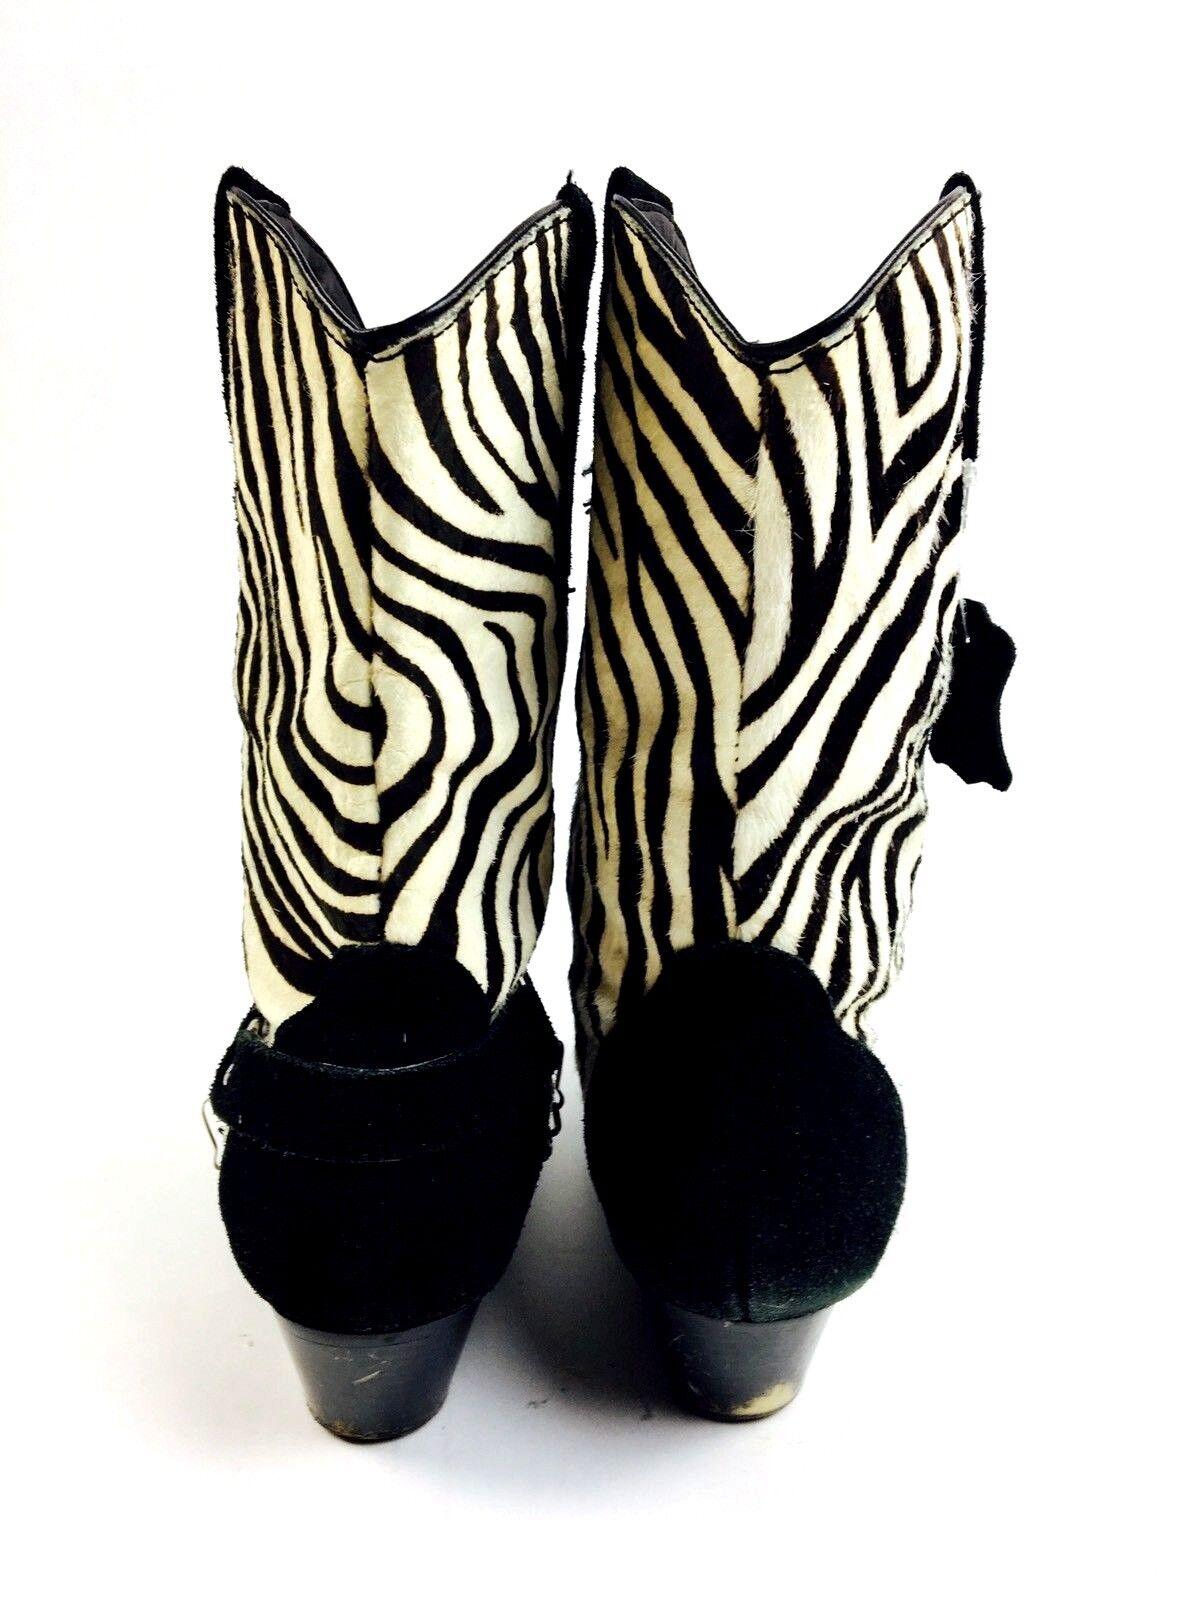 Zebra Cowboy Boots Women's Shoes Women's Boots He… - image 6